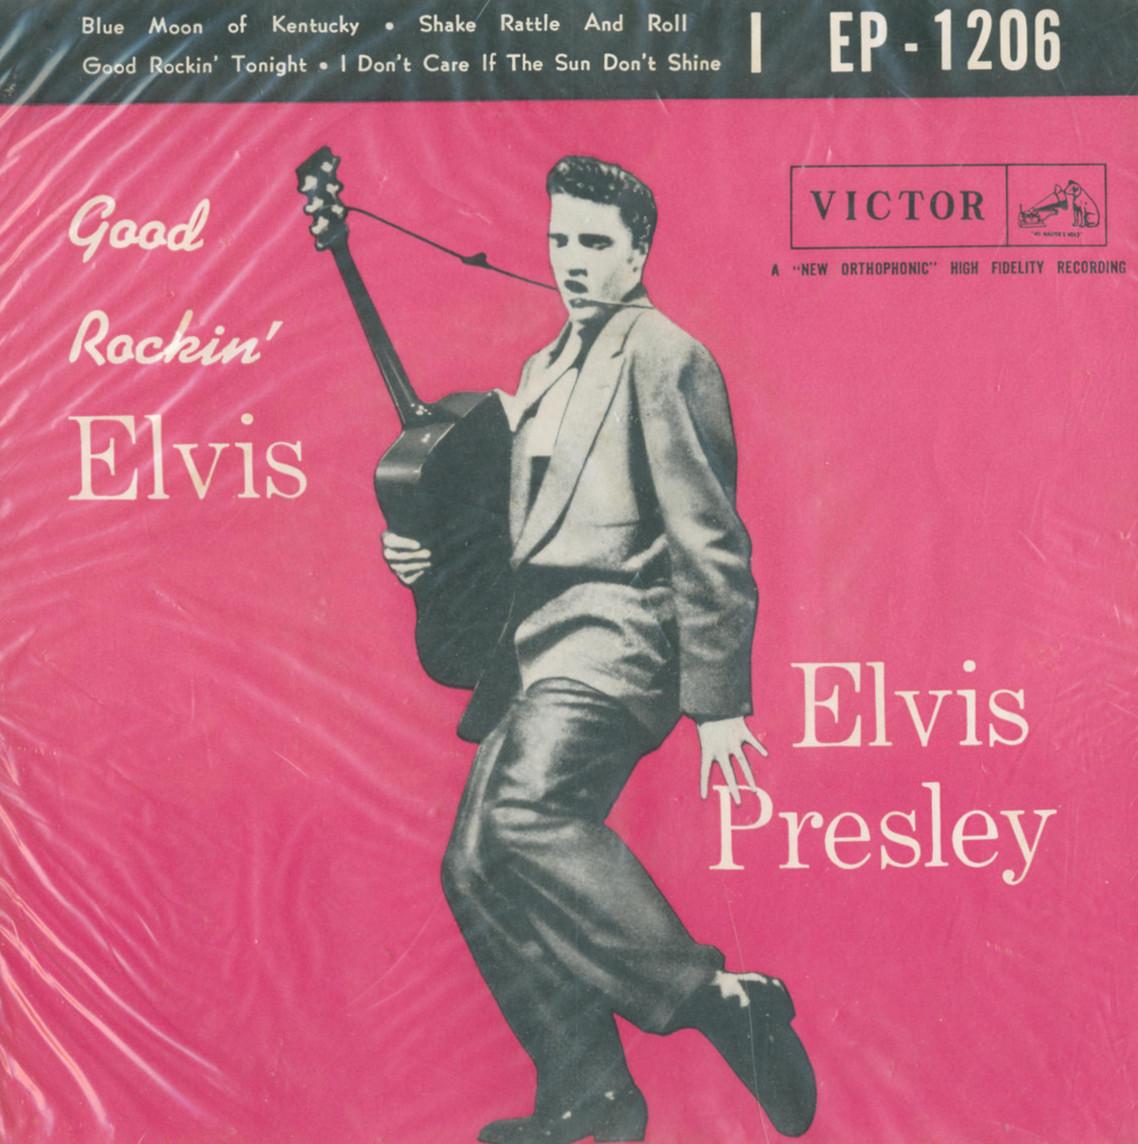 Diskografie Japan 1955 - 1977 Ep-1206fesup